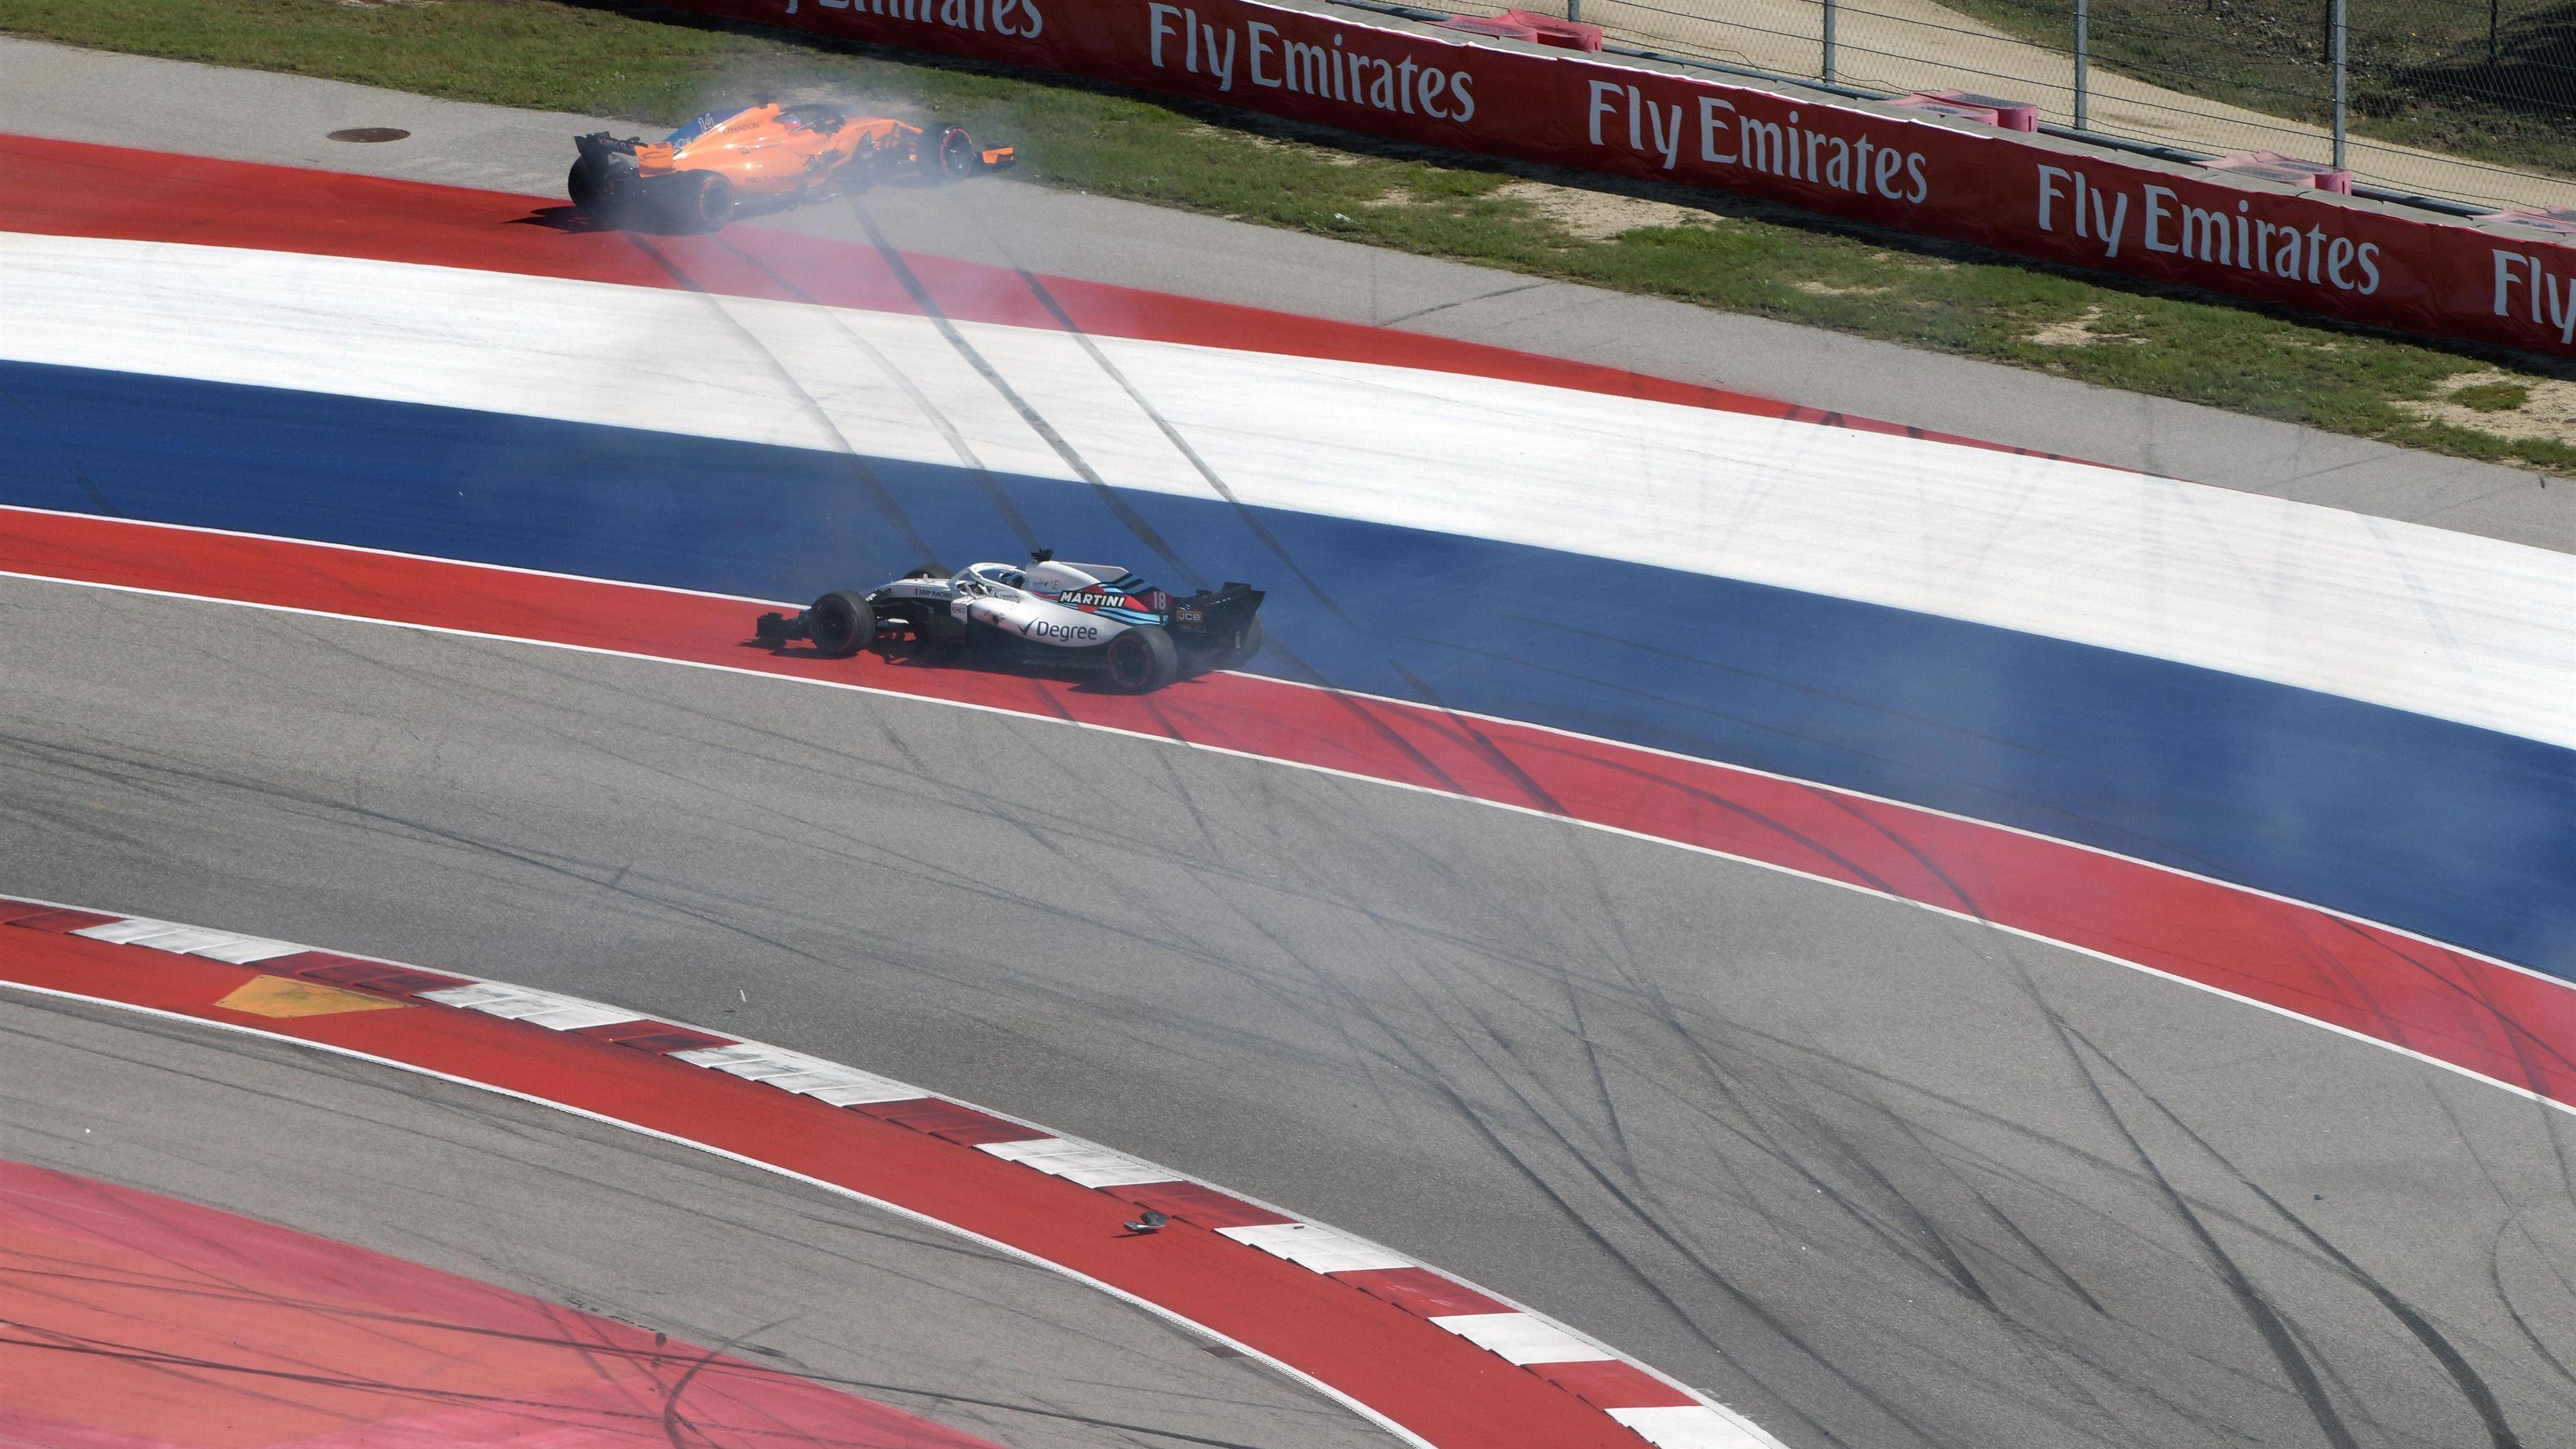 F1: United States Grand Prix 2018 - Fernando Alonso criticises Lance Stroll after lap one crash